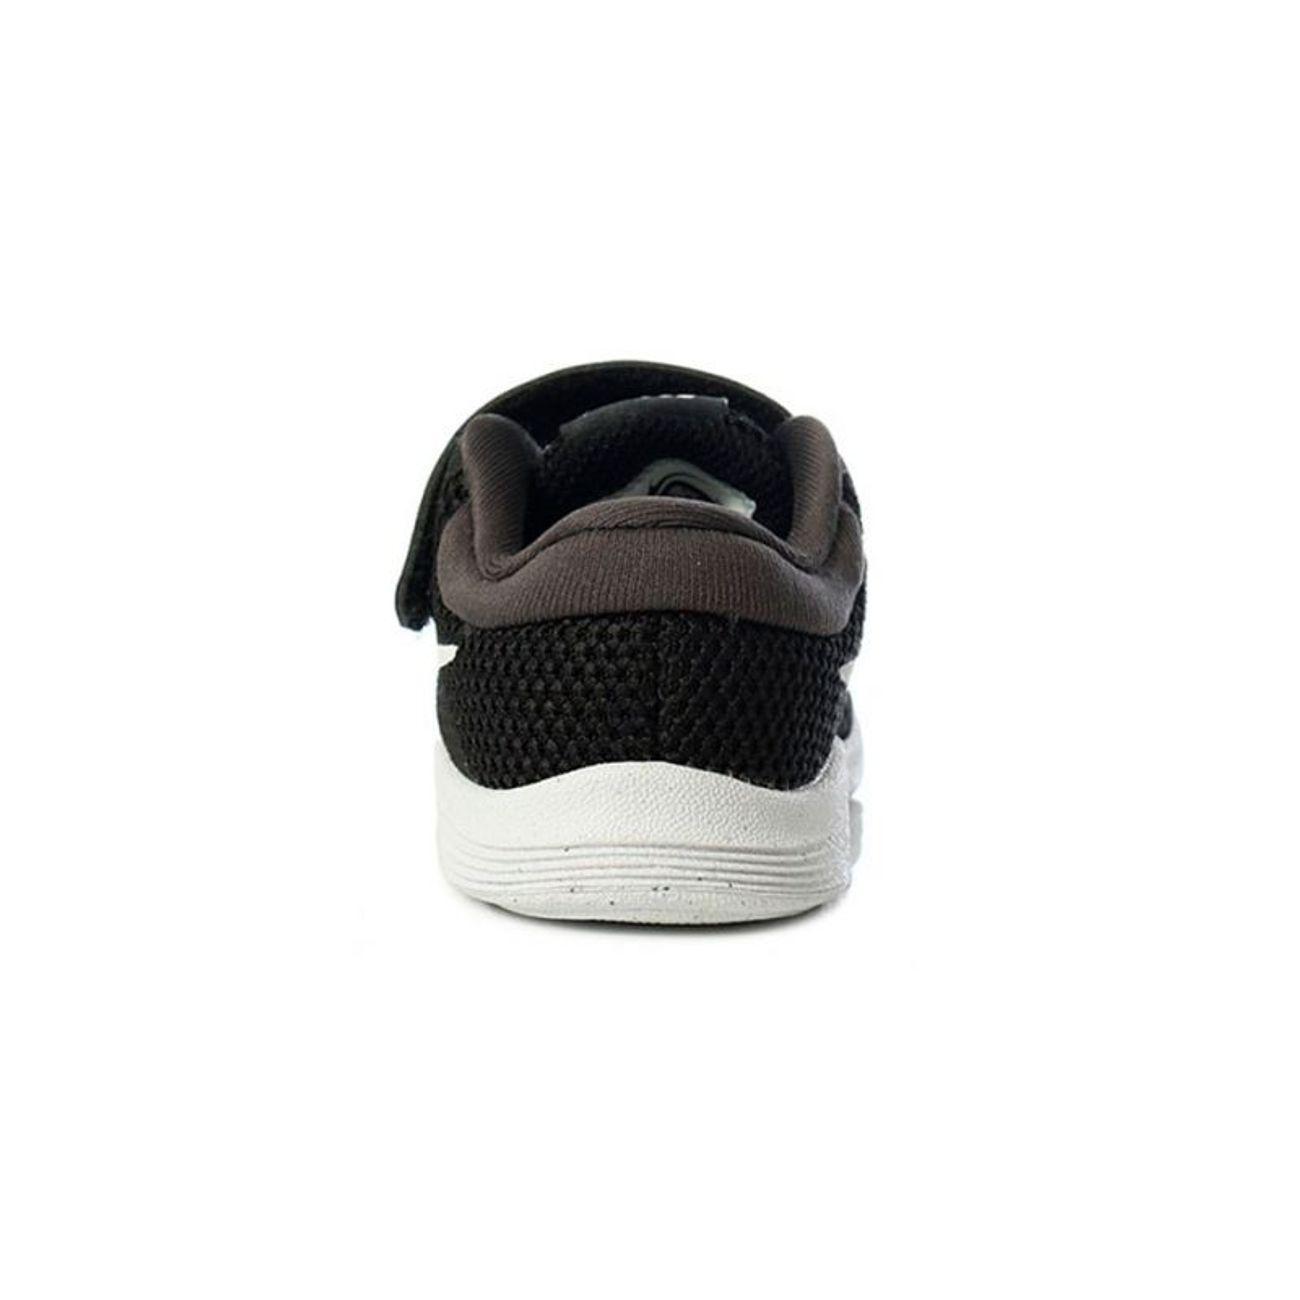 006 Adulte Blanc Noir 4 Nike Ni943304 Padel Revolution kP8nwX0O